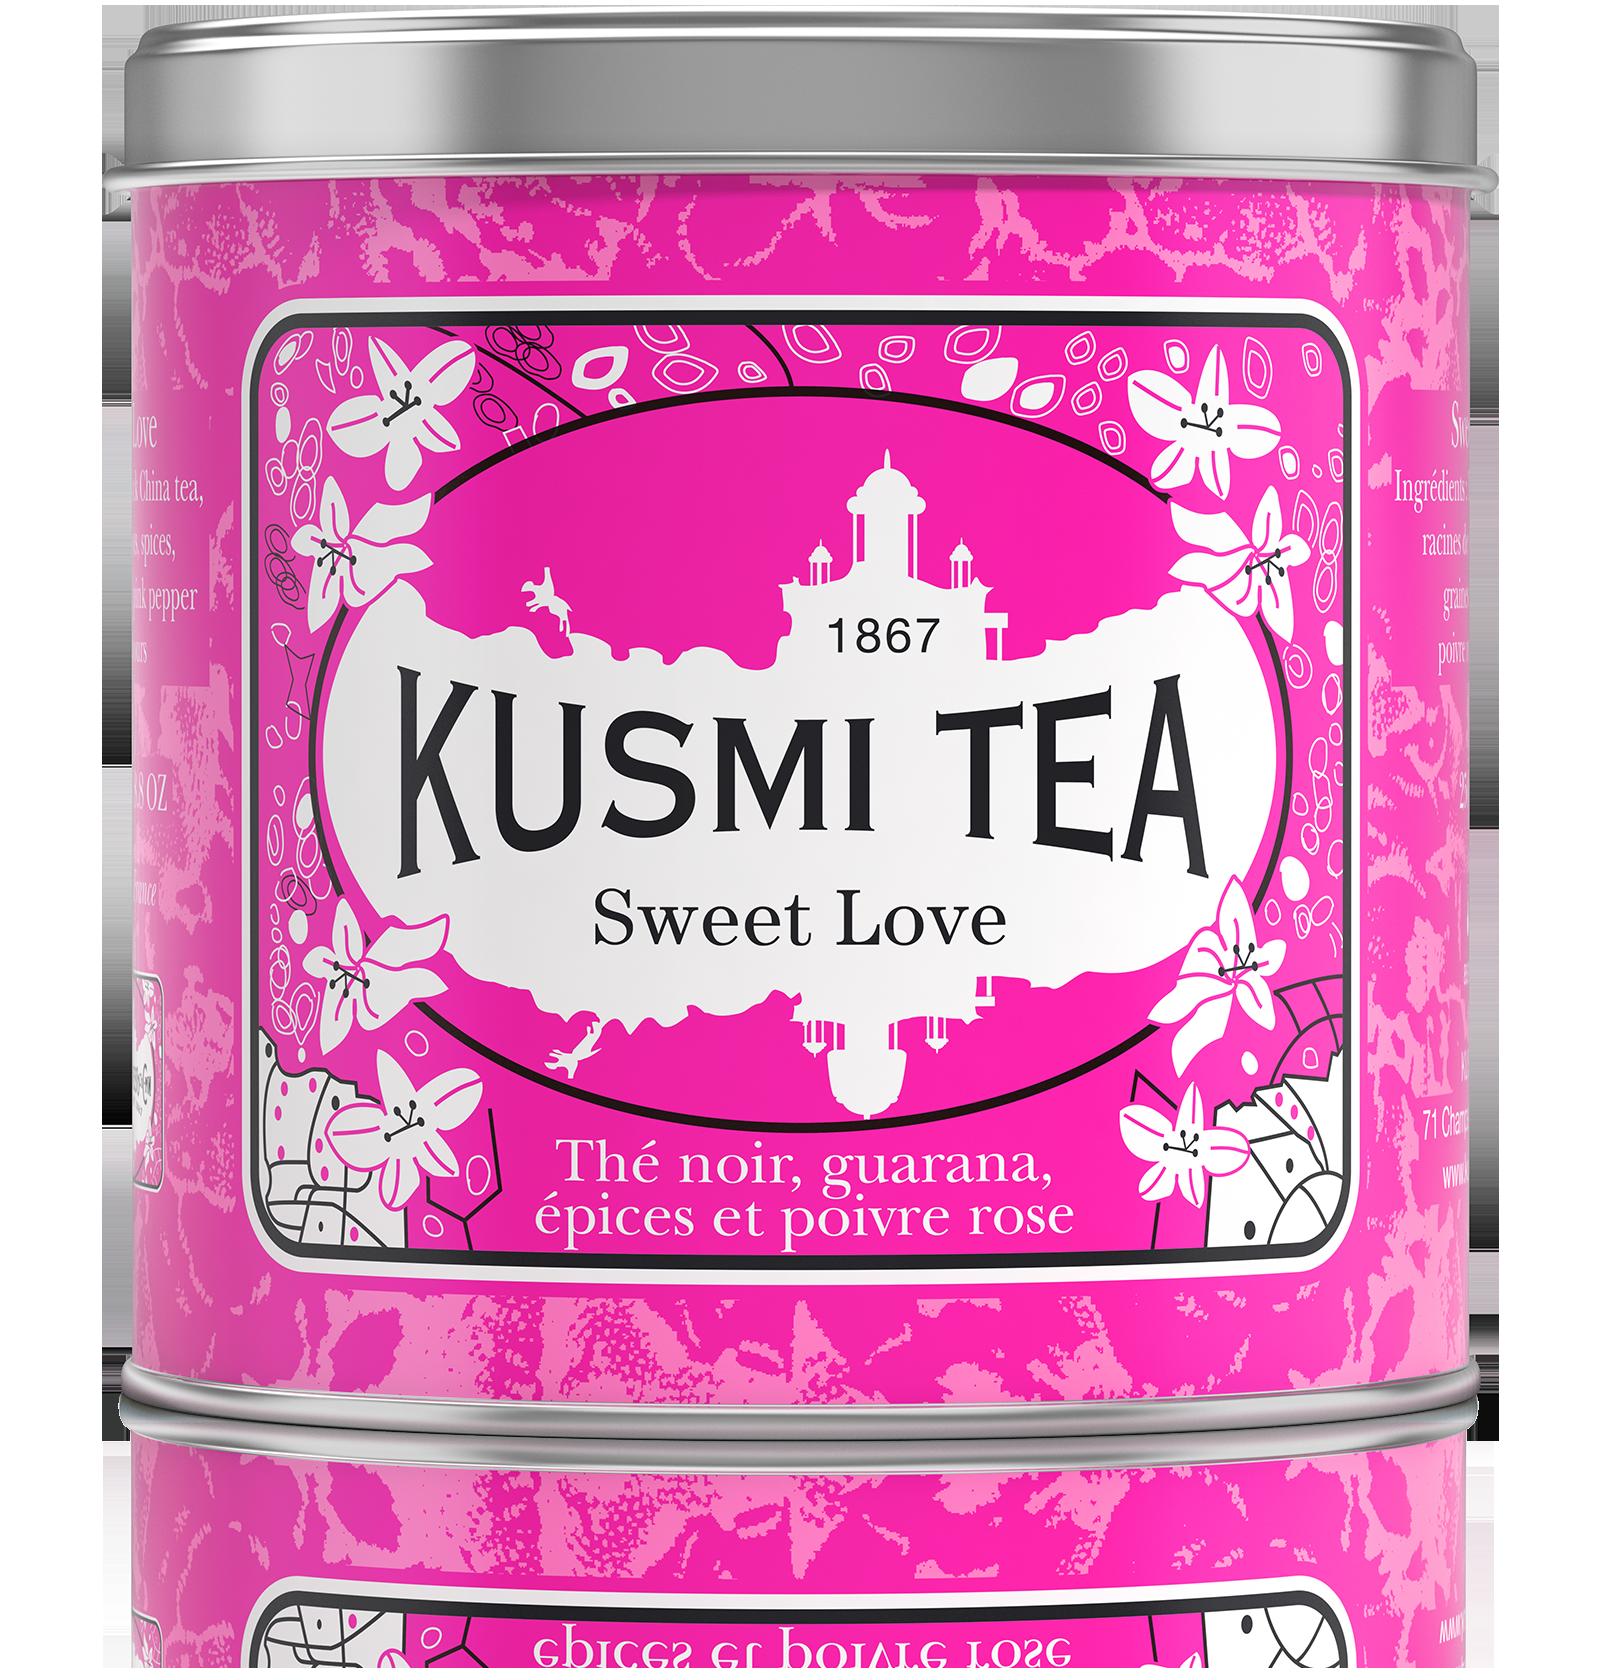 Thé noir - Sweet Love - Vrac - Kusmi Tea